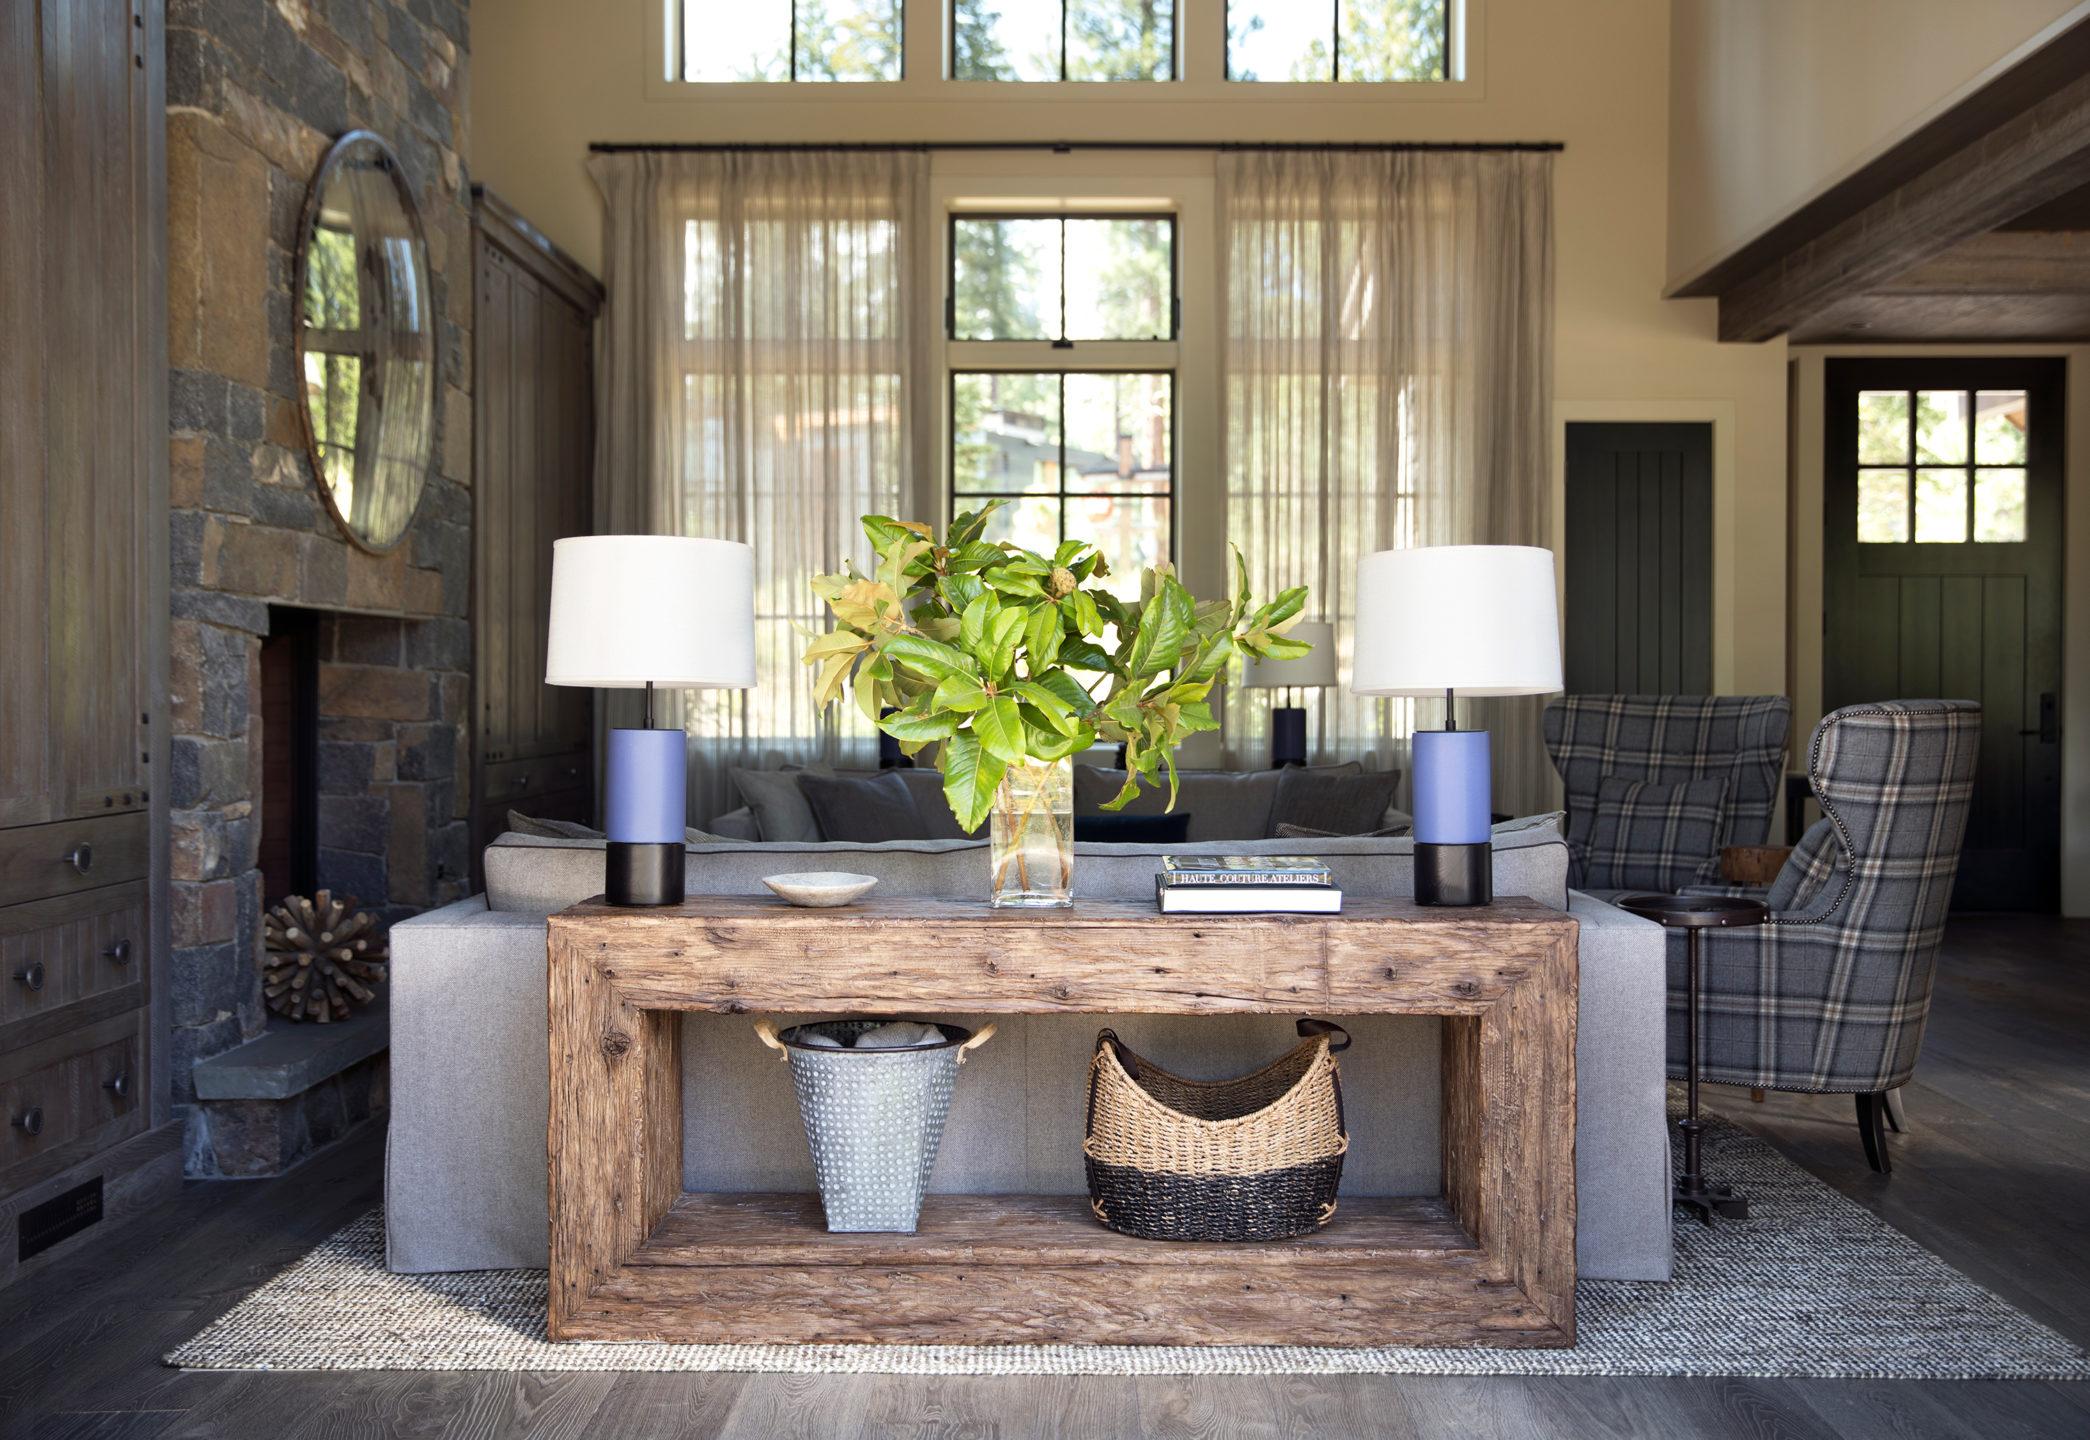 Jennifer_robins_interiors_projects_martis_camp_Del_Grand_07_HR_living_room_LR_alt_angle